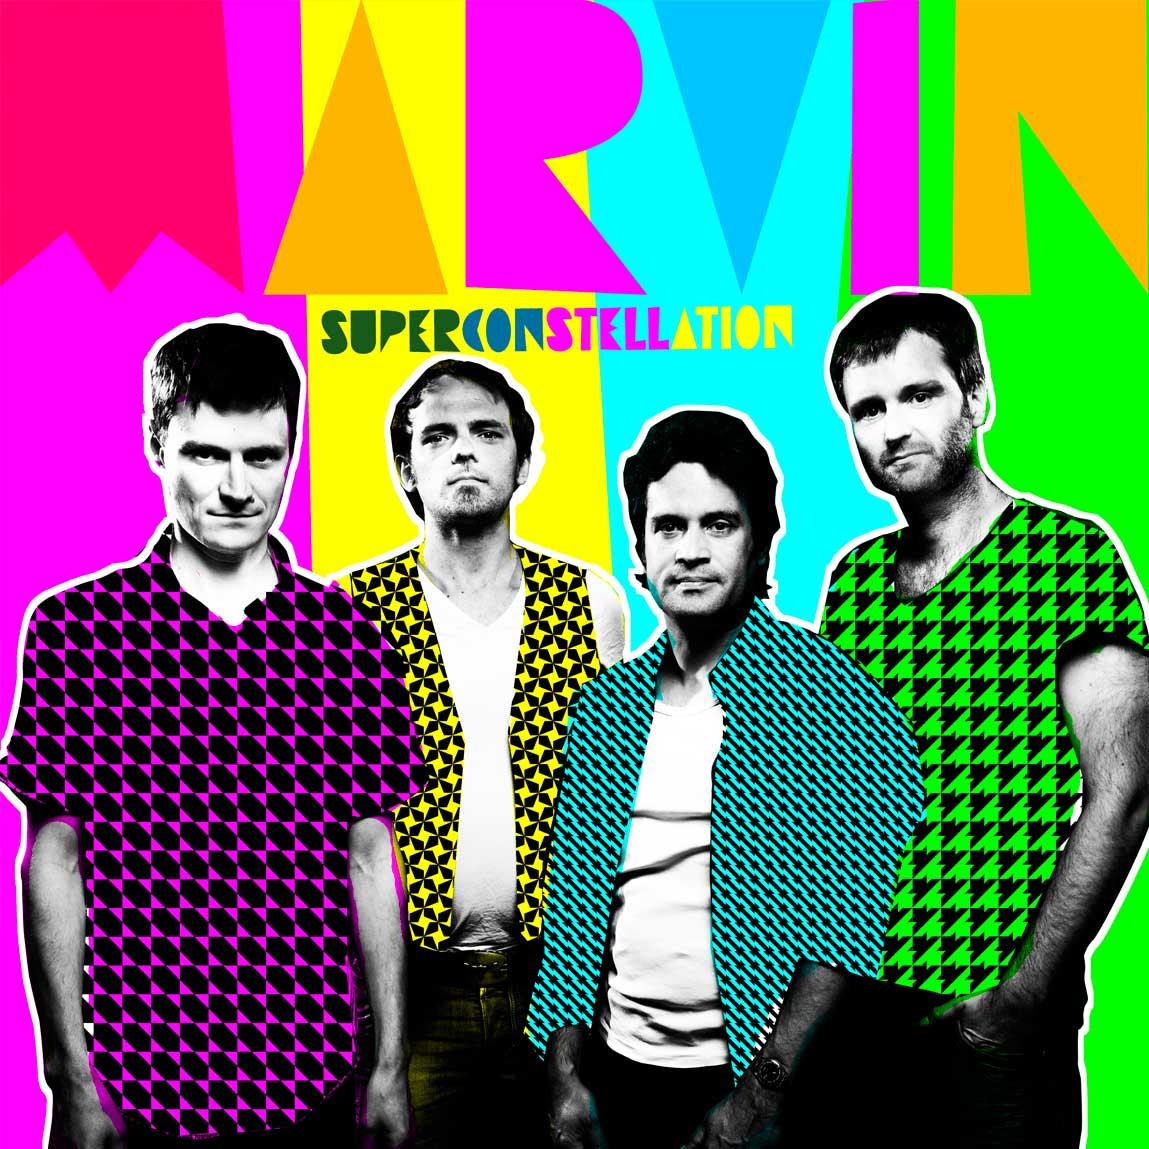 Marvin This Super Constellation LP Cover Variante 1